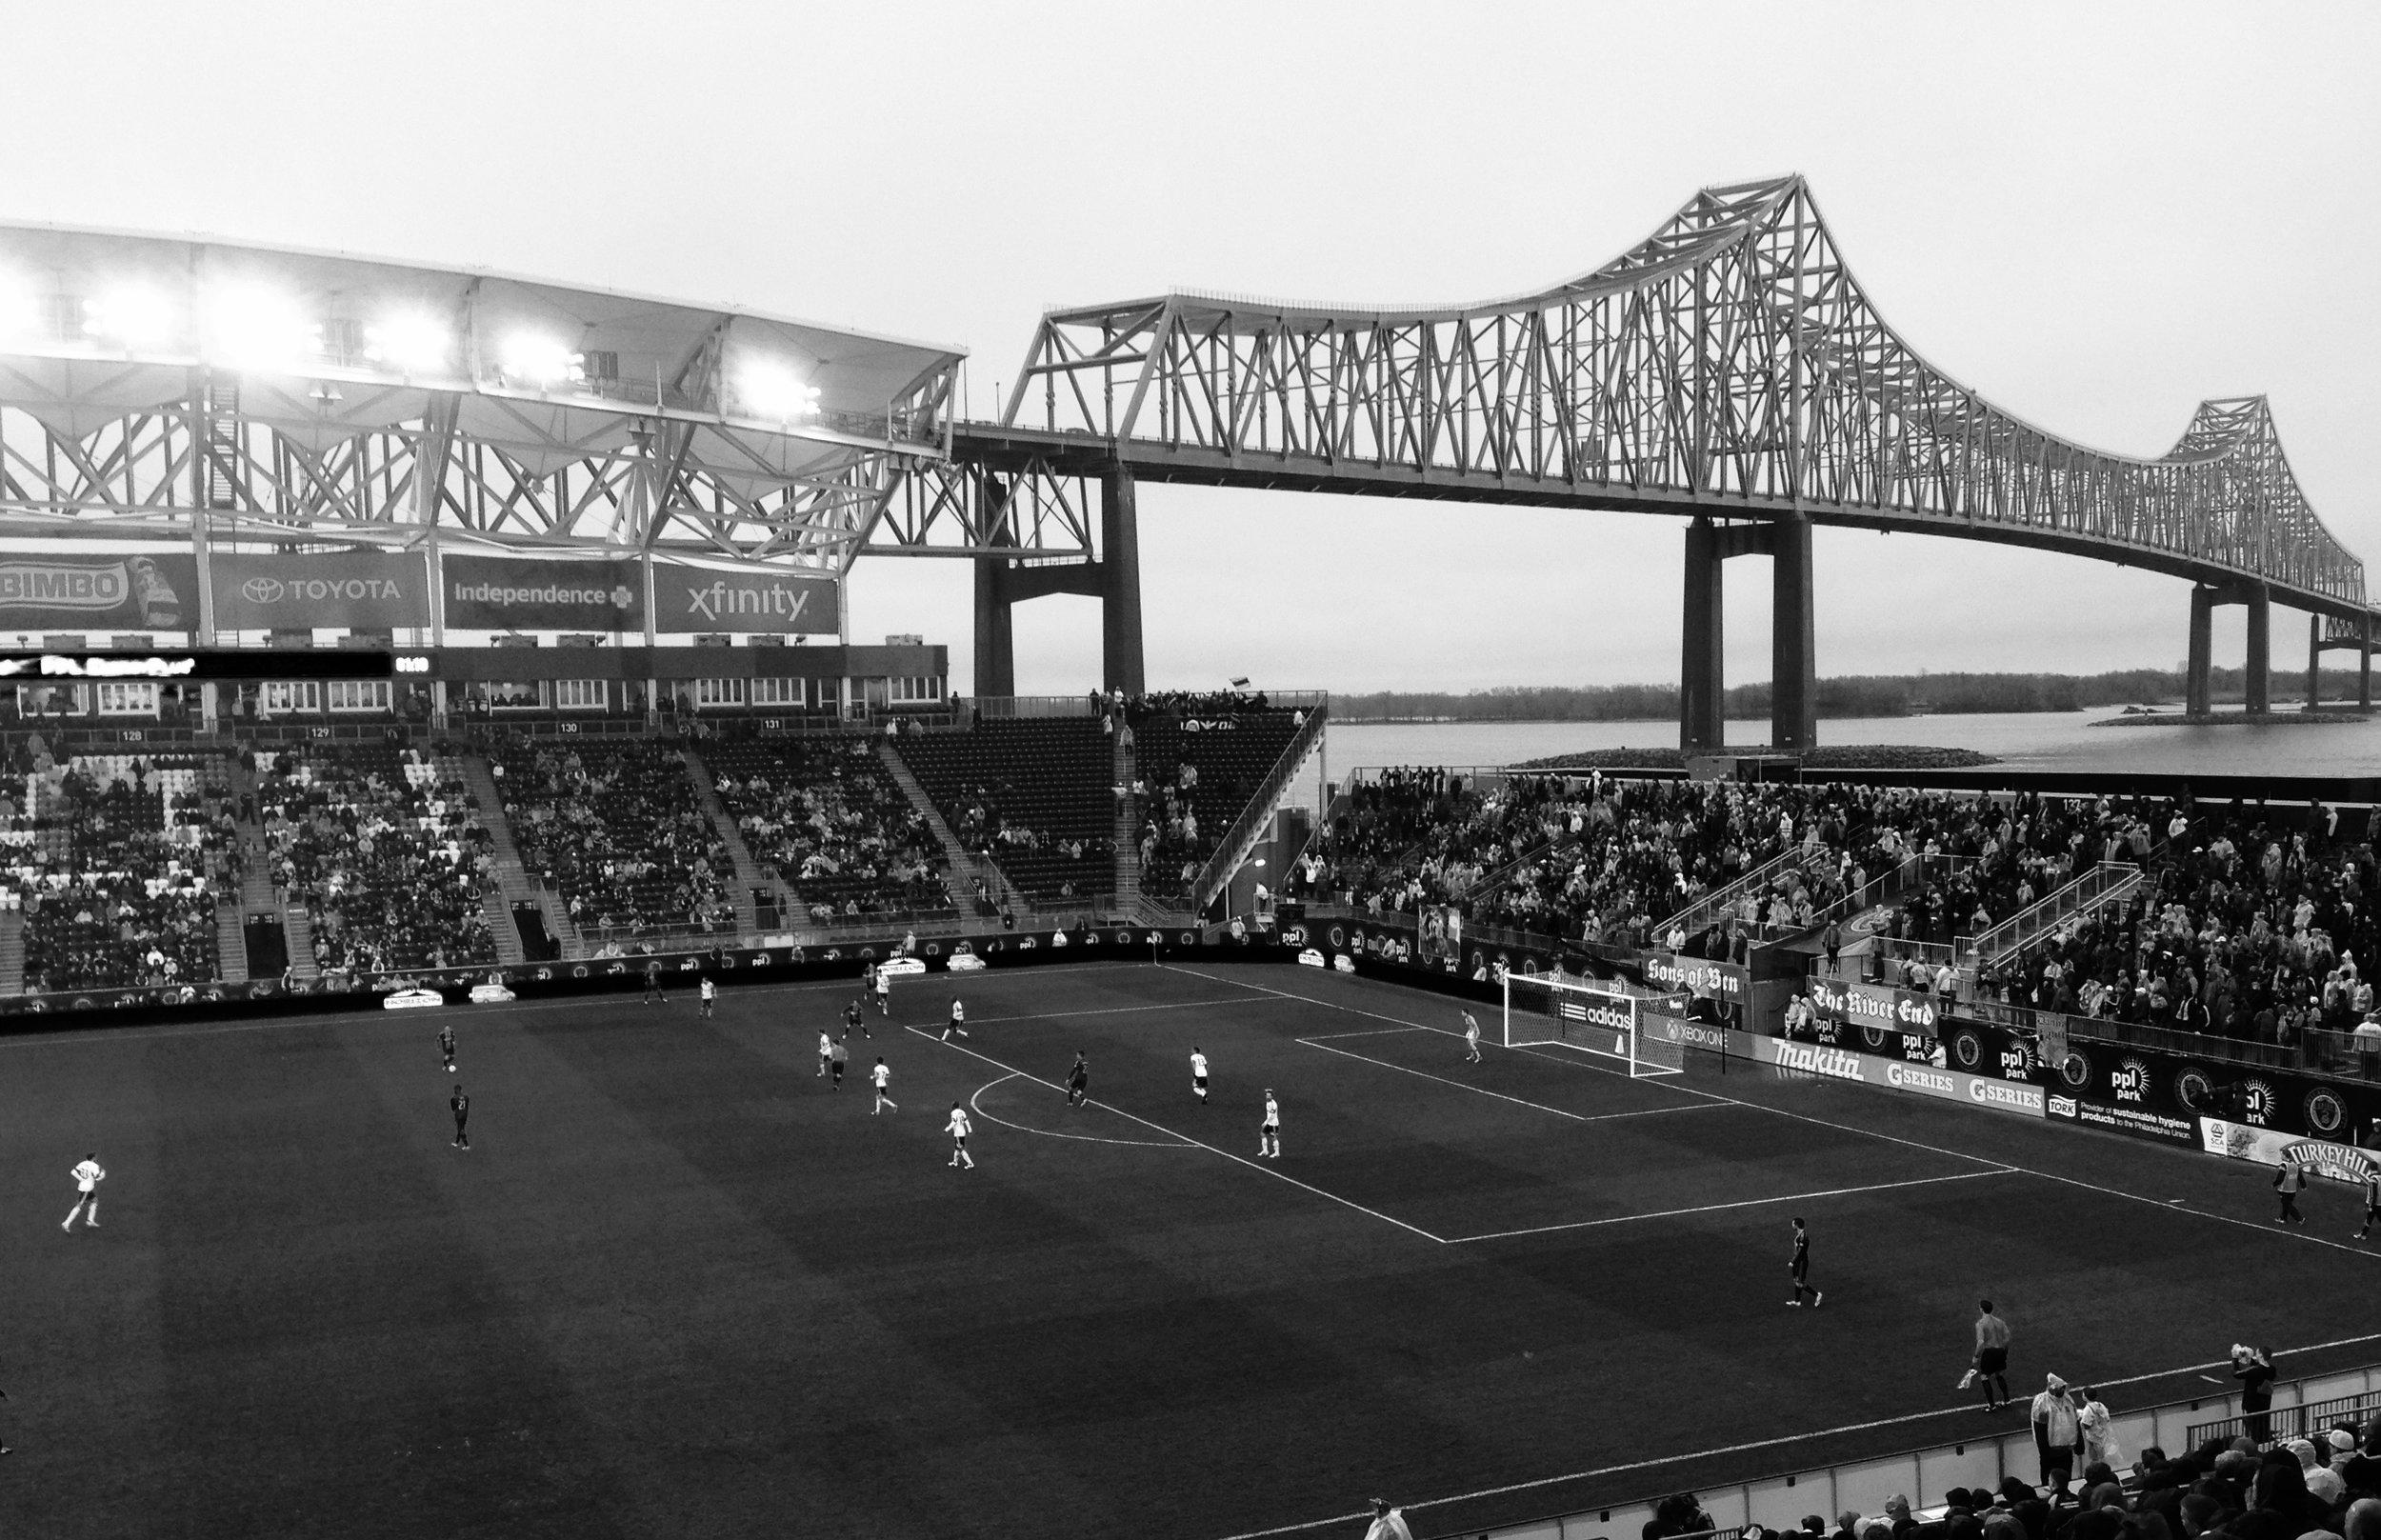 Soccer field in America #2